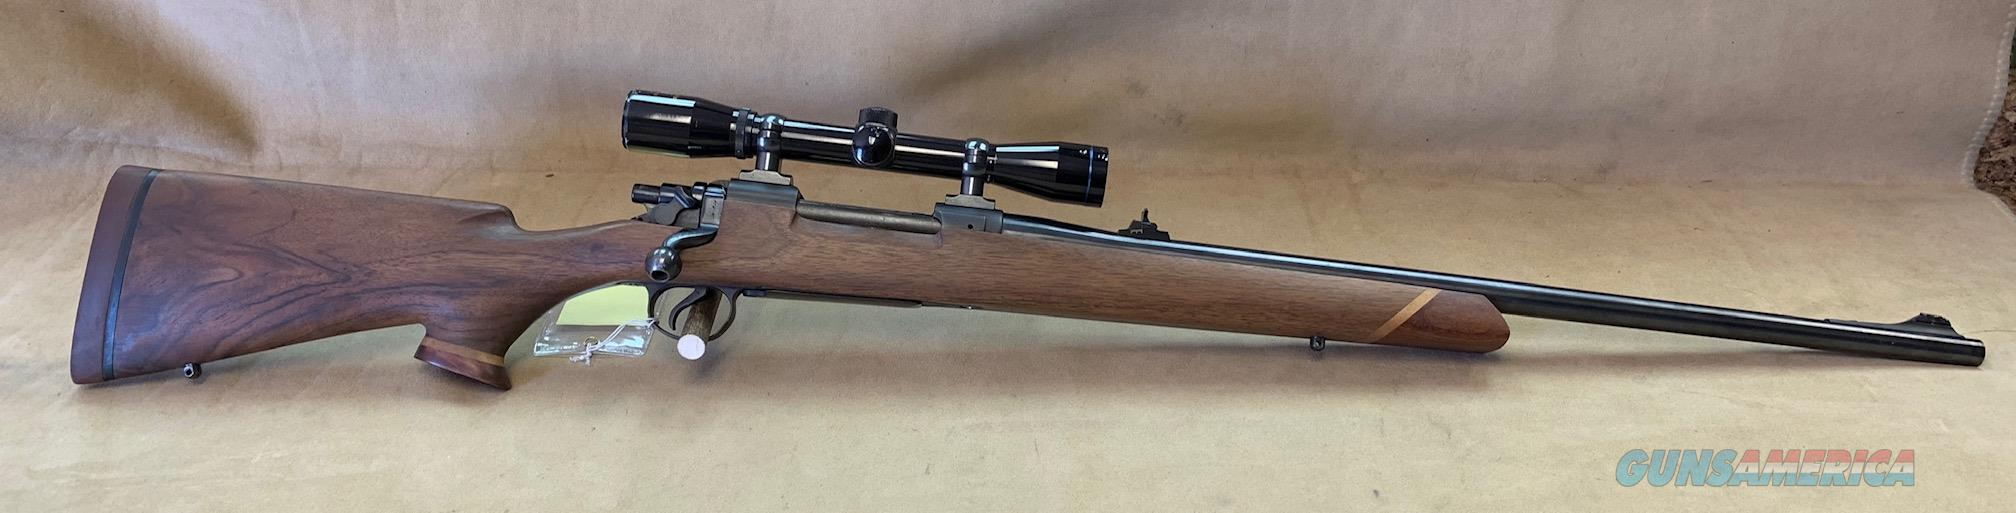 Enfield P1914 Customized - 45/70  Guns > Rifles > Enfield Rifle